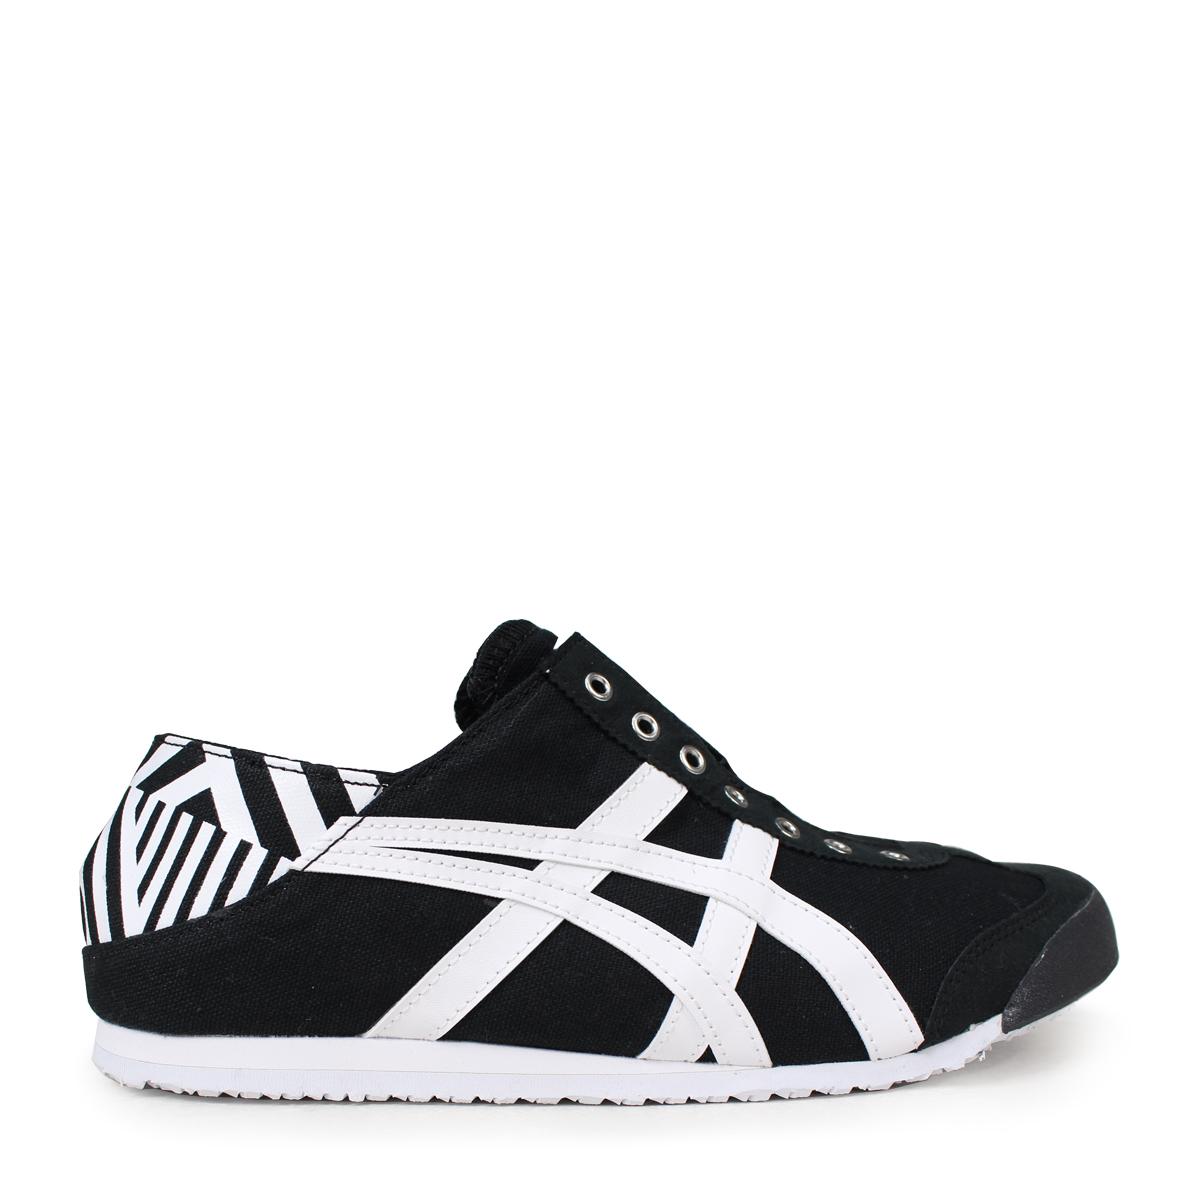 new style b8f01 34257 Onitsuka Tiger MEXICO 66 PARATY Onitsuka tiger Mexico 66 slip-ons men gap  Dis sneakers TH342N-9001 black [184]